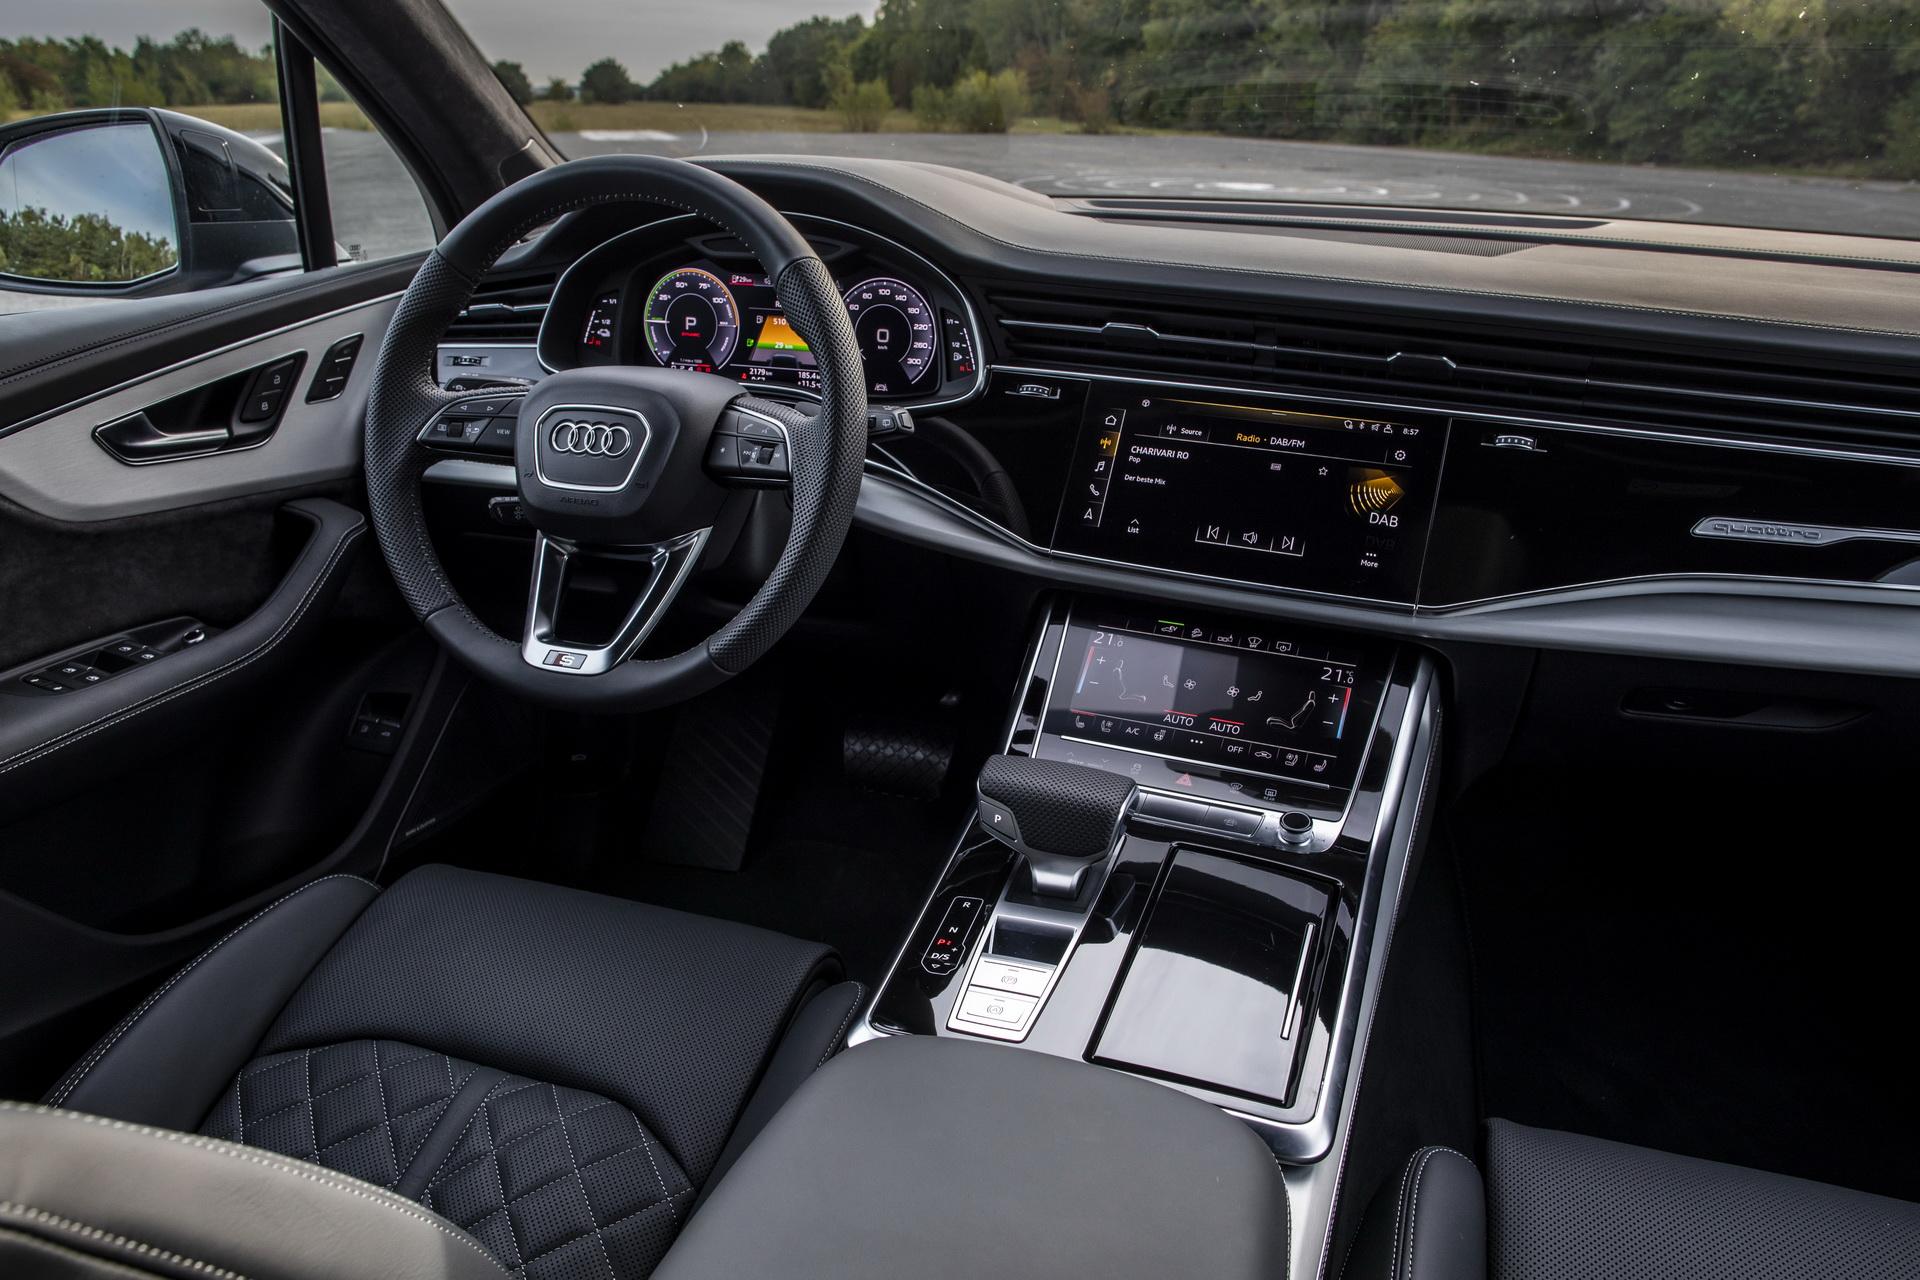 Audi Q7 Híbrido Plug-in